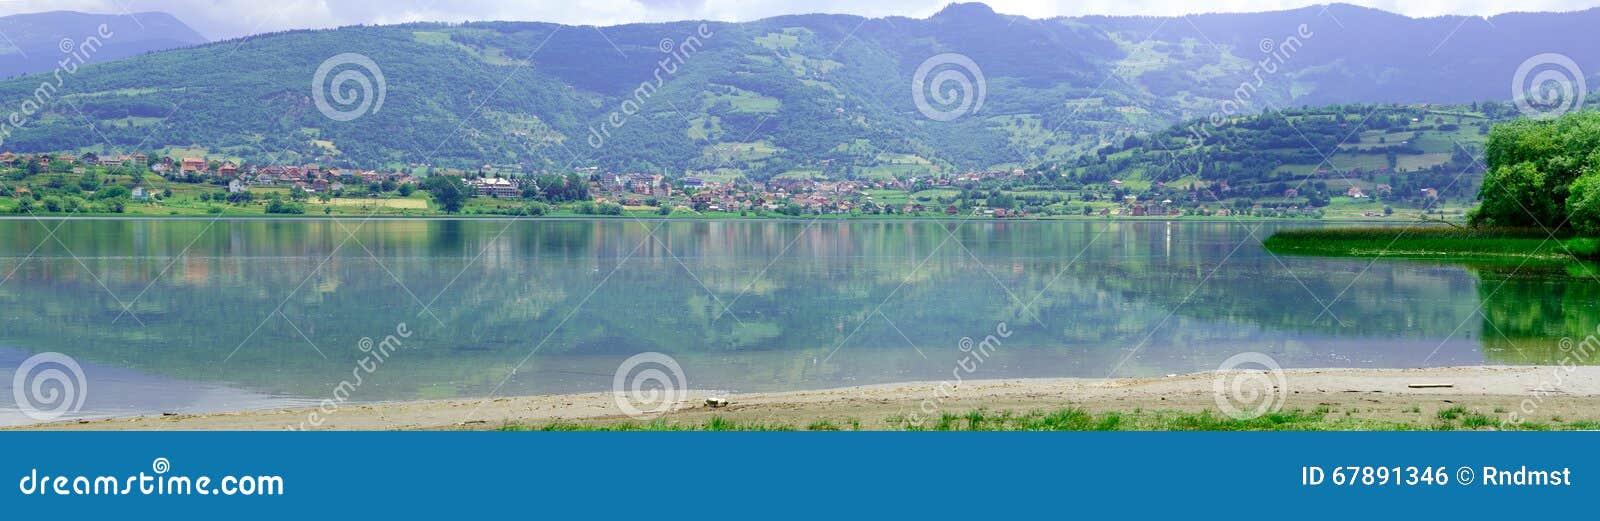 Plav jezioro